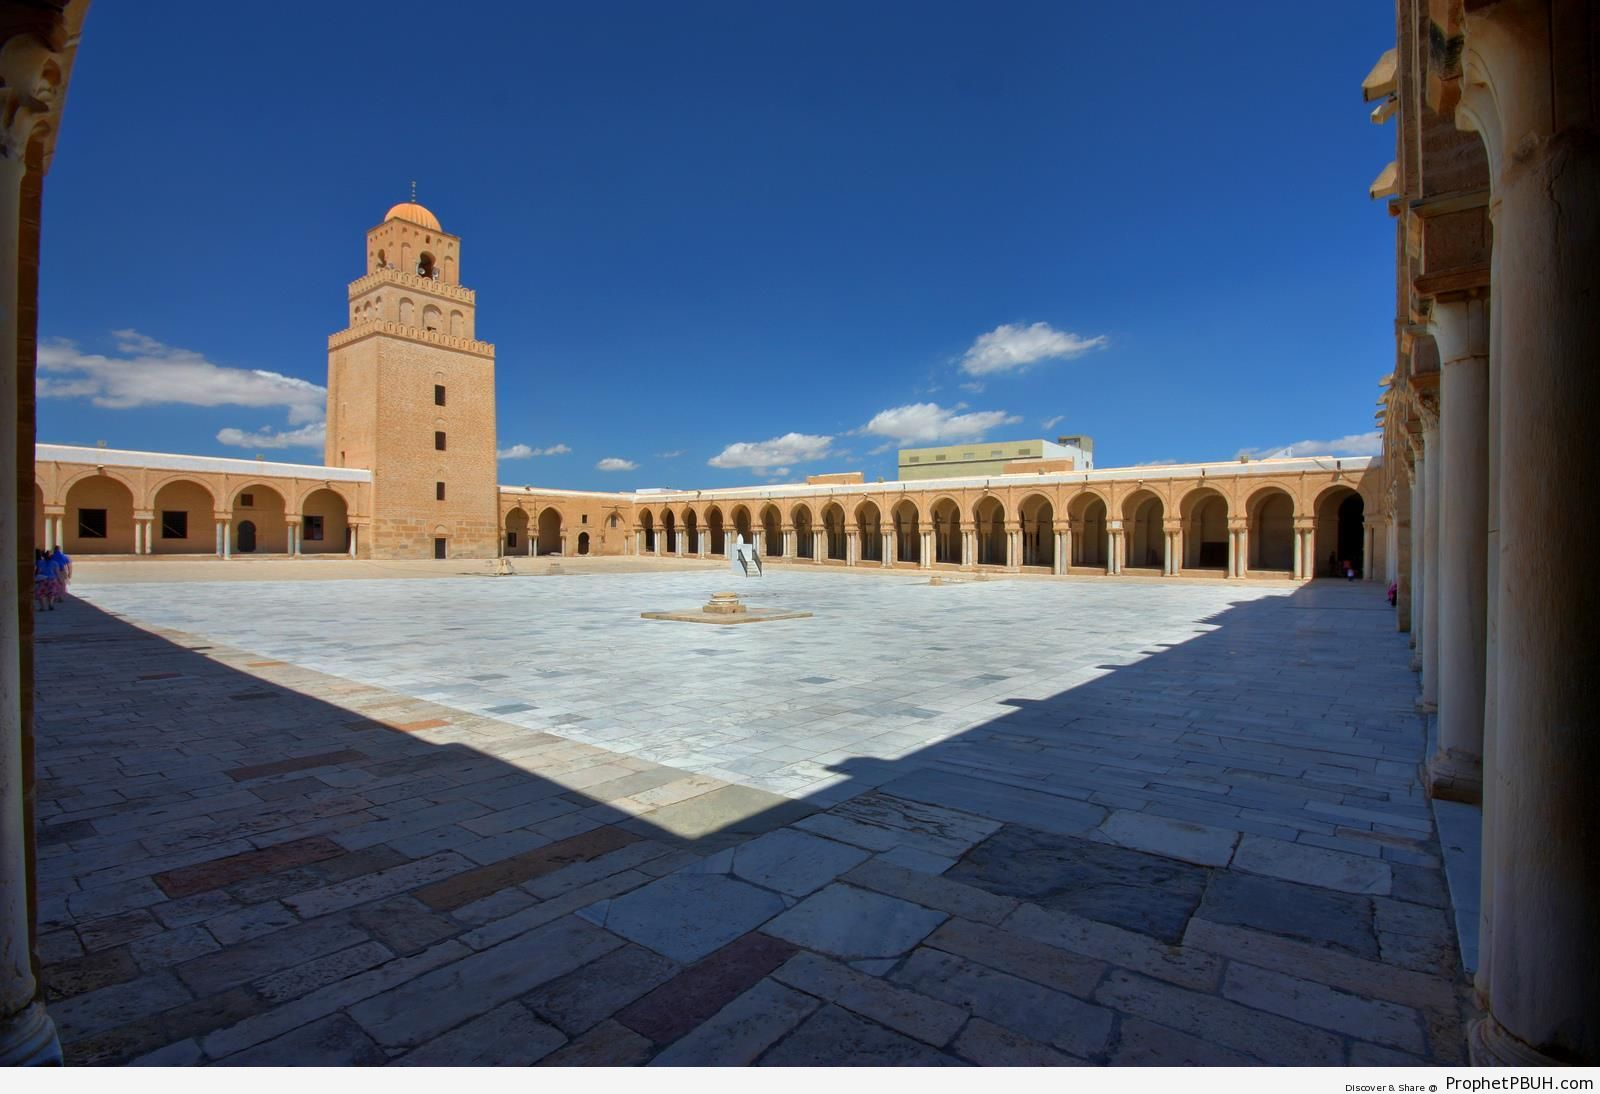 Mosque of Uqba (The Great Mosque of Kairouan) in Kairouan, Tunisia - Islamic Architecture